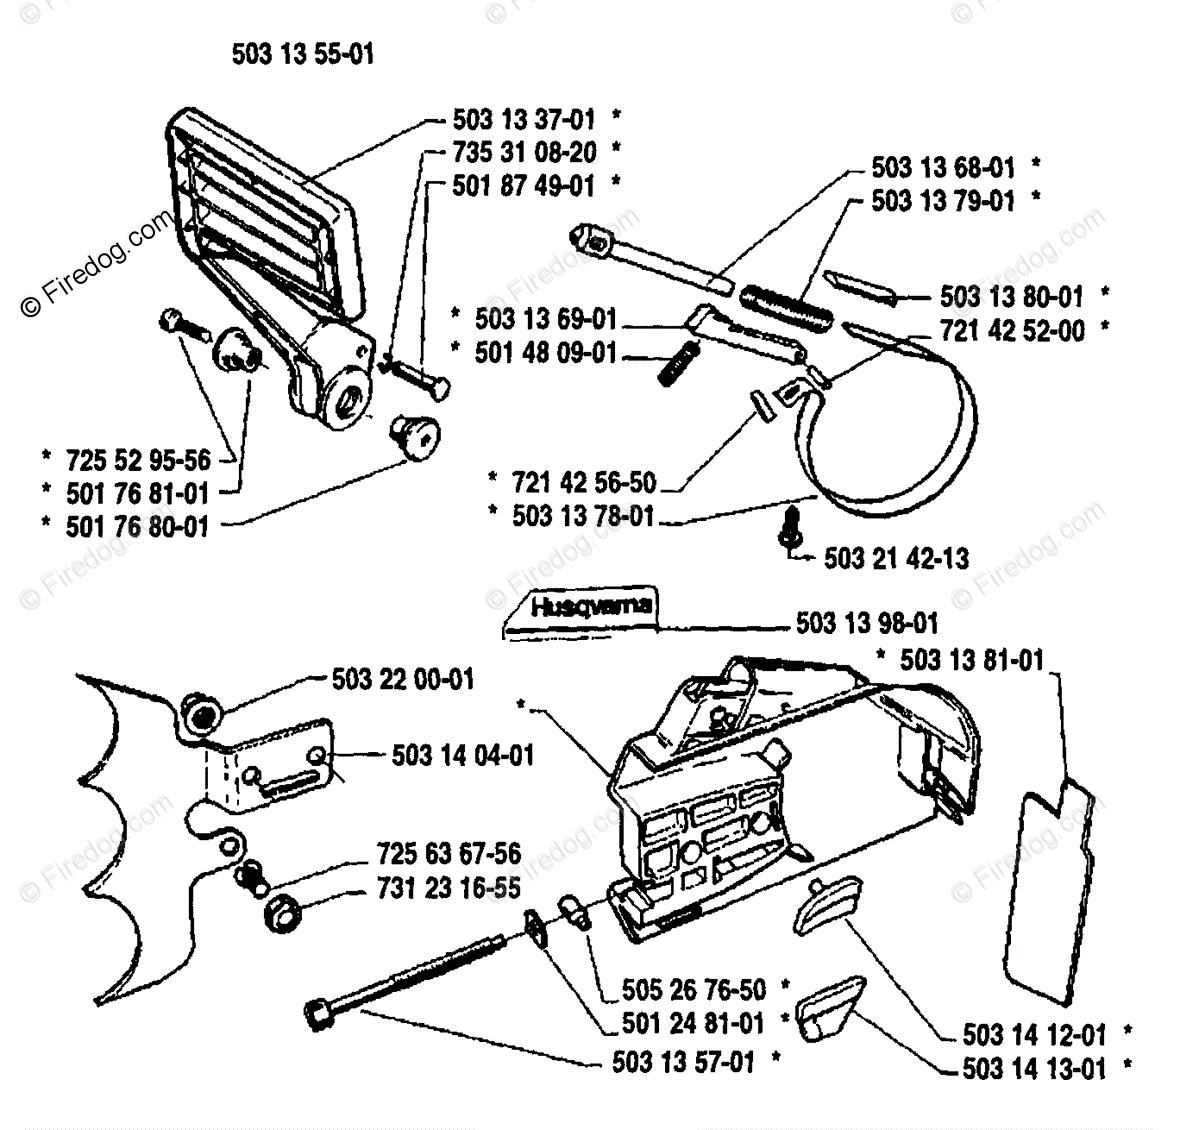 Husqvarna Chain Saw 3120 (1989-02) OEM Parts Diagram for